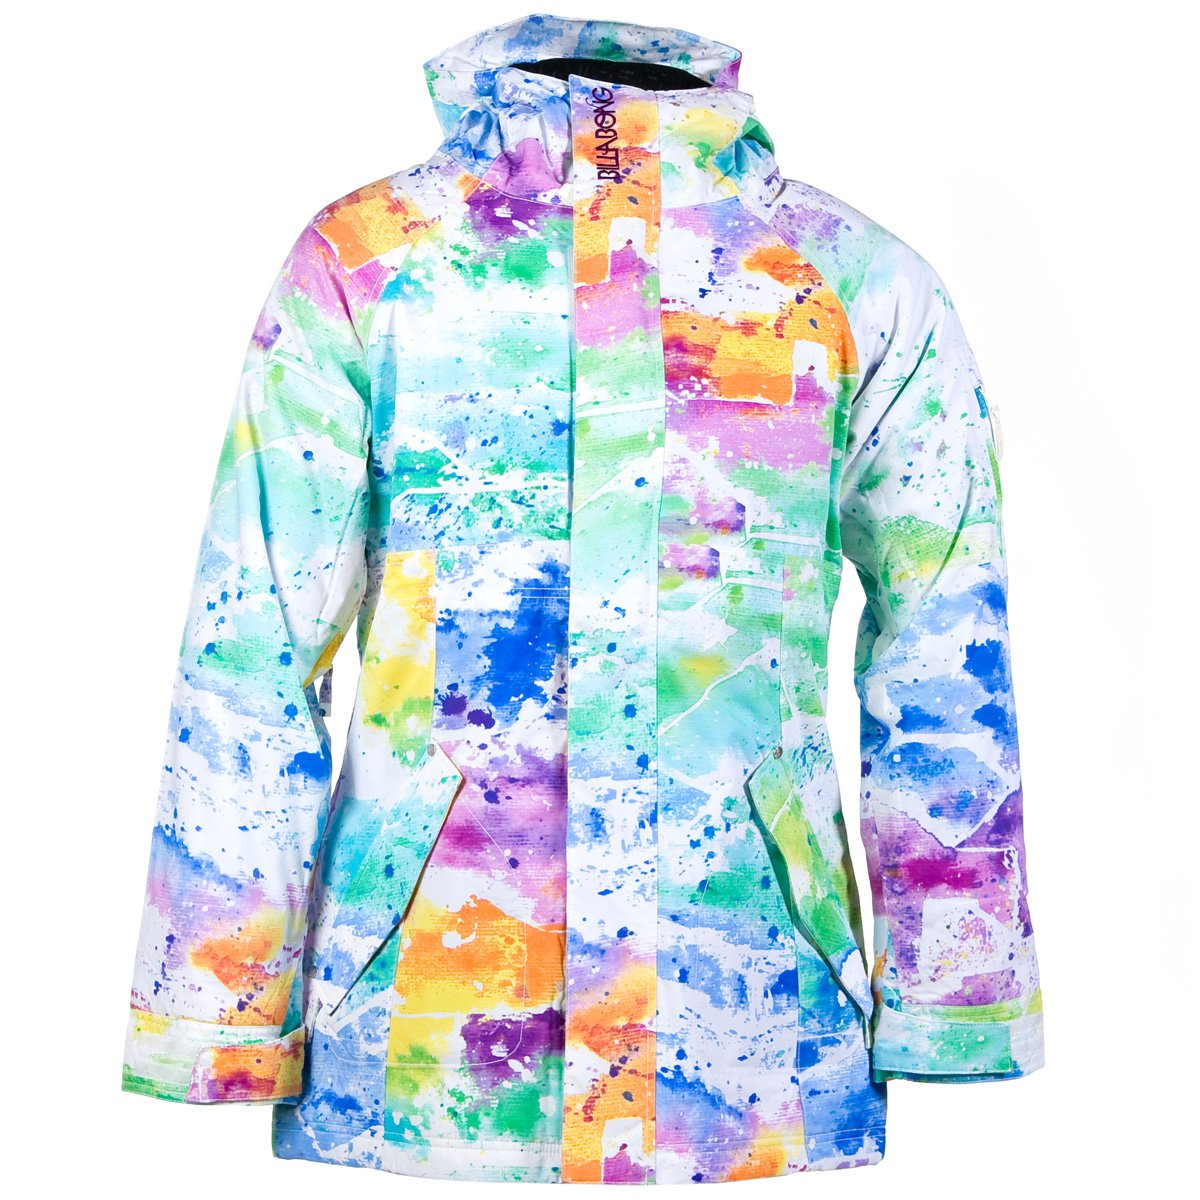 Billabong Anne Flore Snowboardjacke Jacke Damen günstig online kaufen